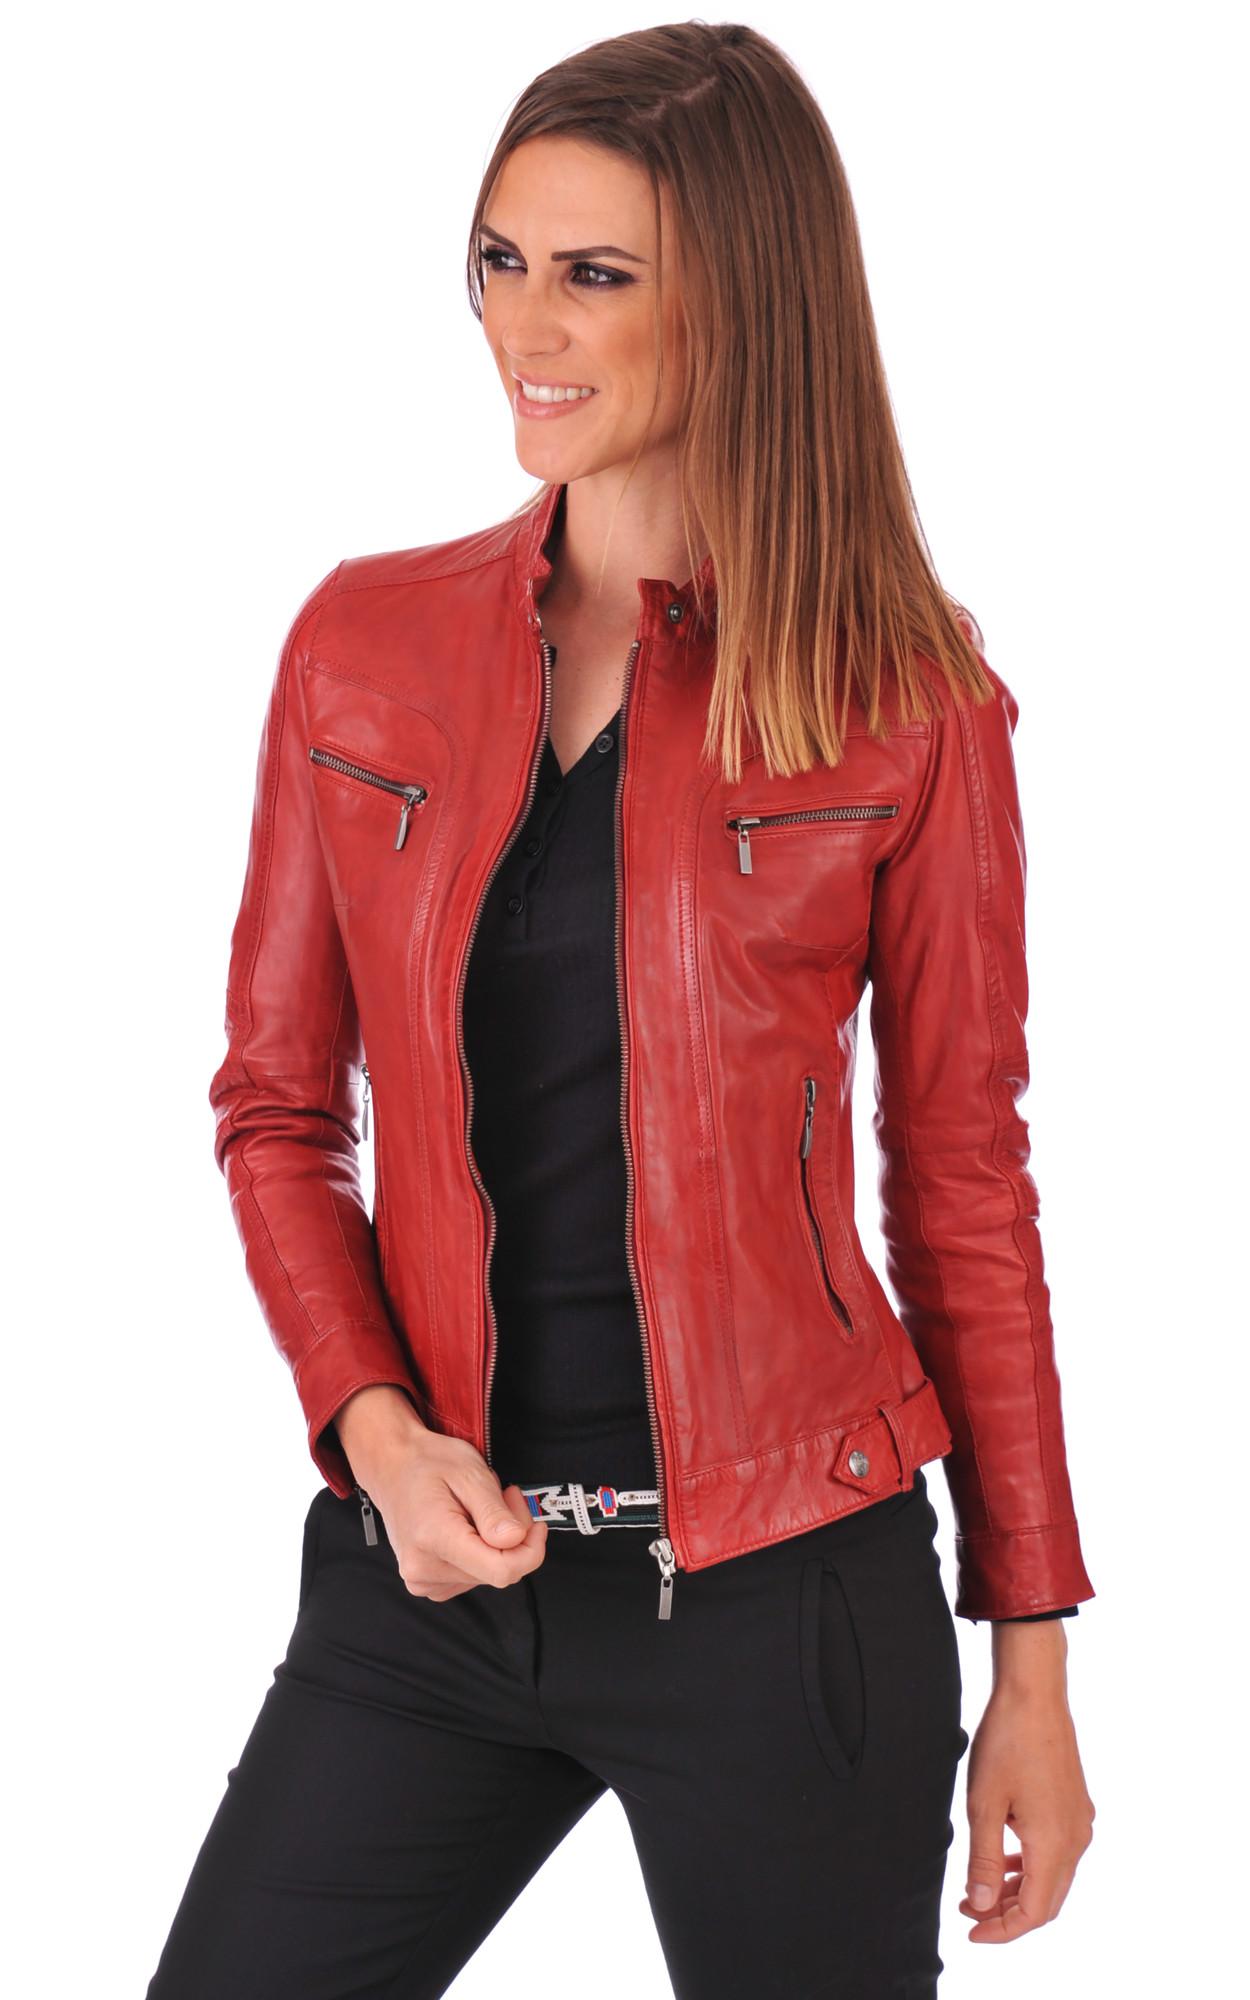 veste simili cuir rouge bordeaux femme vestes l gantes. Black Bedroom Furniture Sets. Home Design Ideas